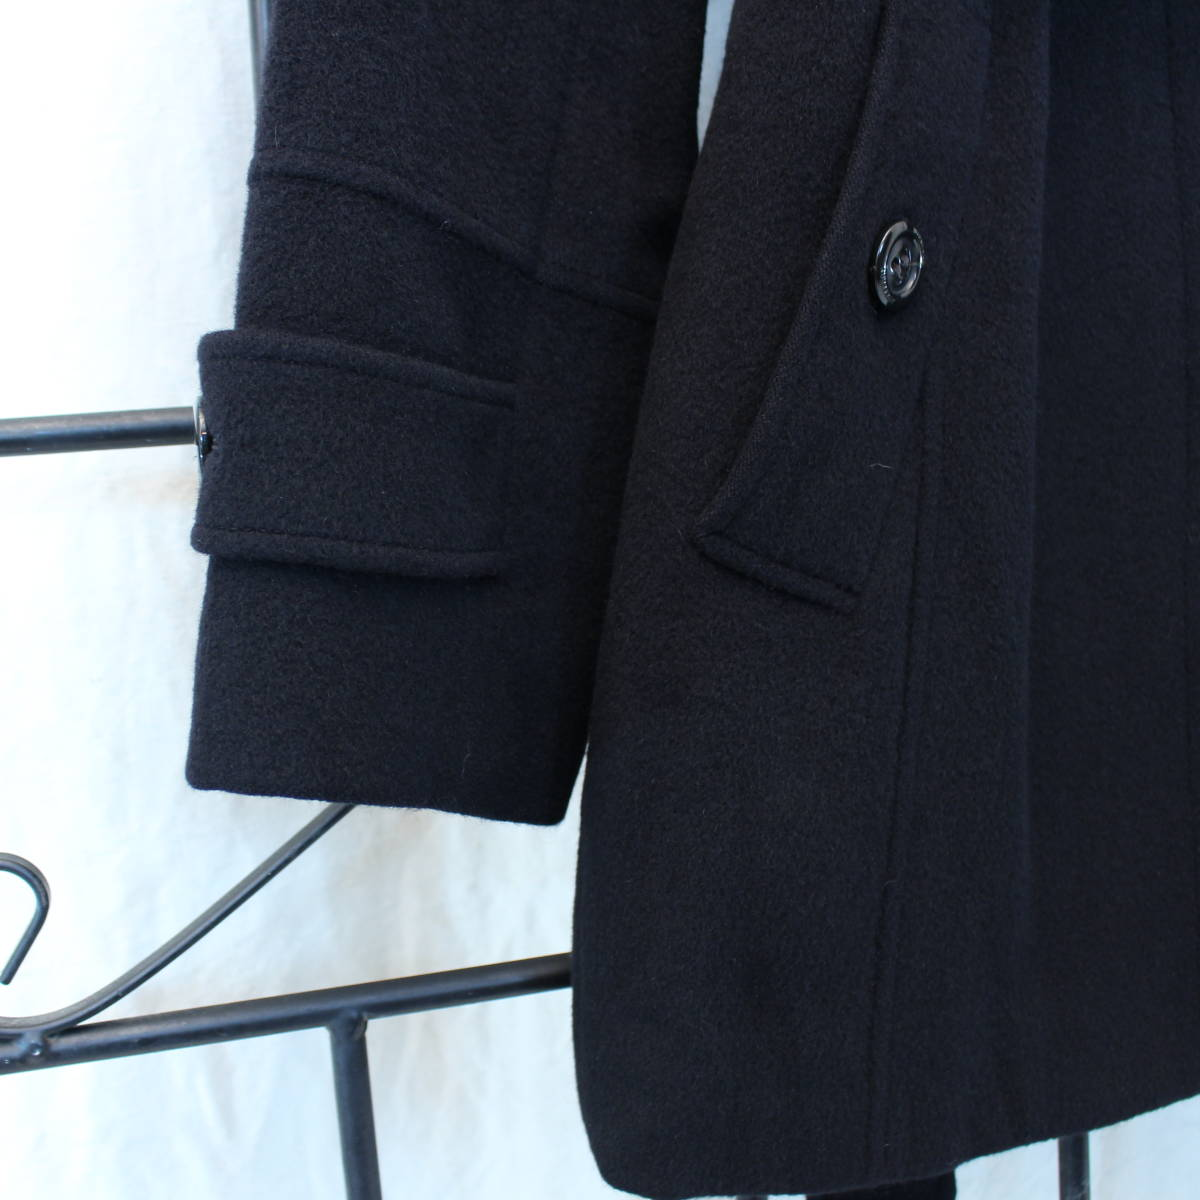 BURBERRY LONDON ANGORA BREND WOOL BELTED COAT MADE IN JAPAN/バーバリーロンドンアンゴラ混ウールベルテッドコート_画像5